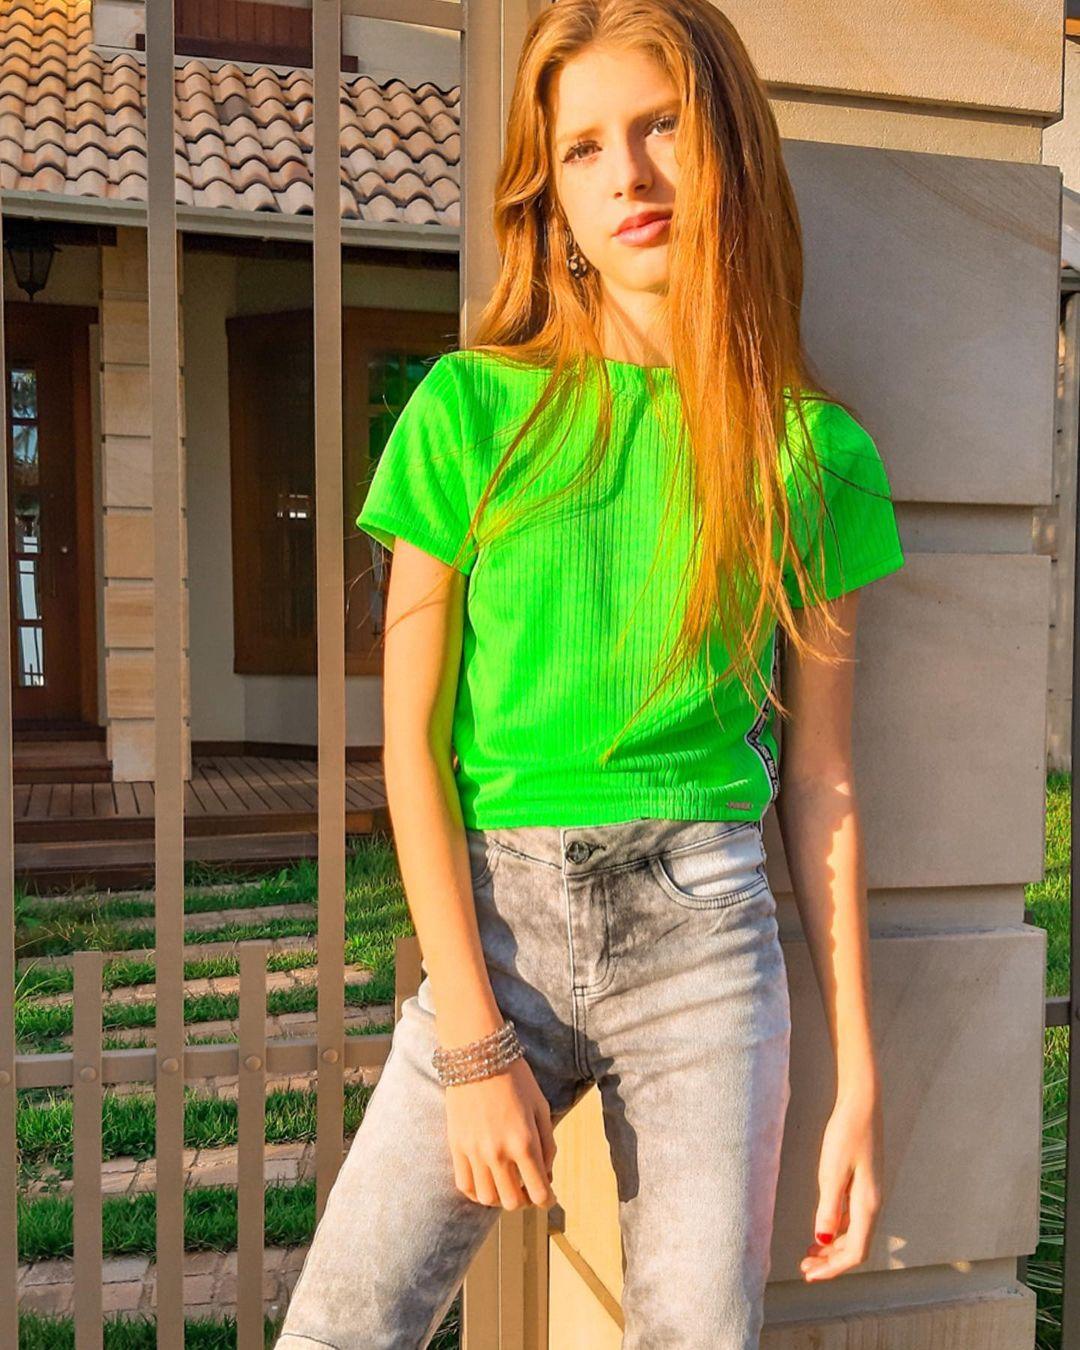 Julia-Vitoria-Mayer-Wallpapers-Insta-Fit-Bio-1